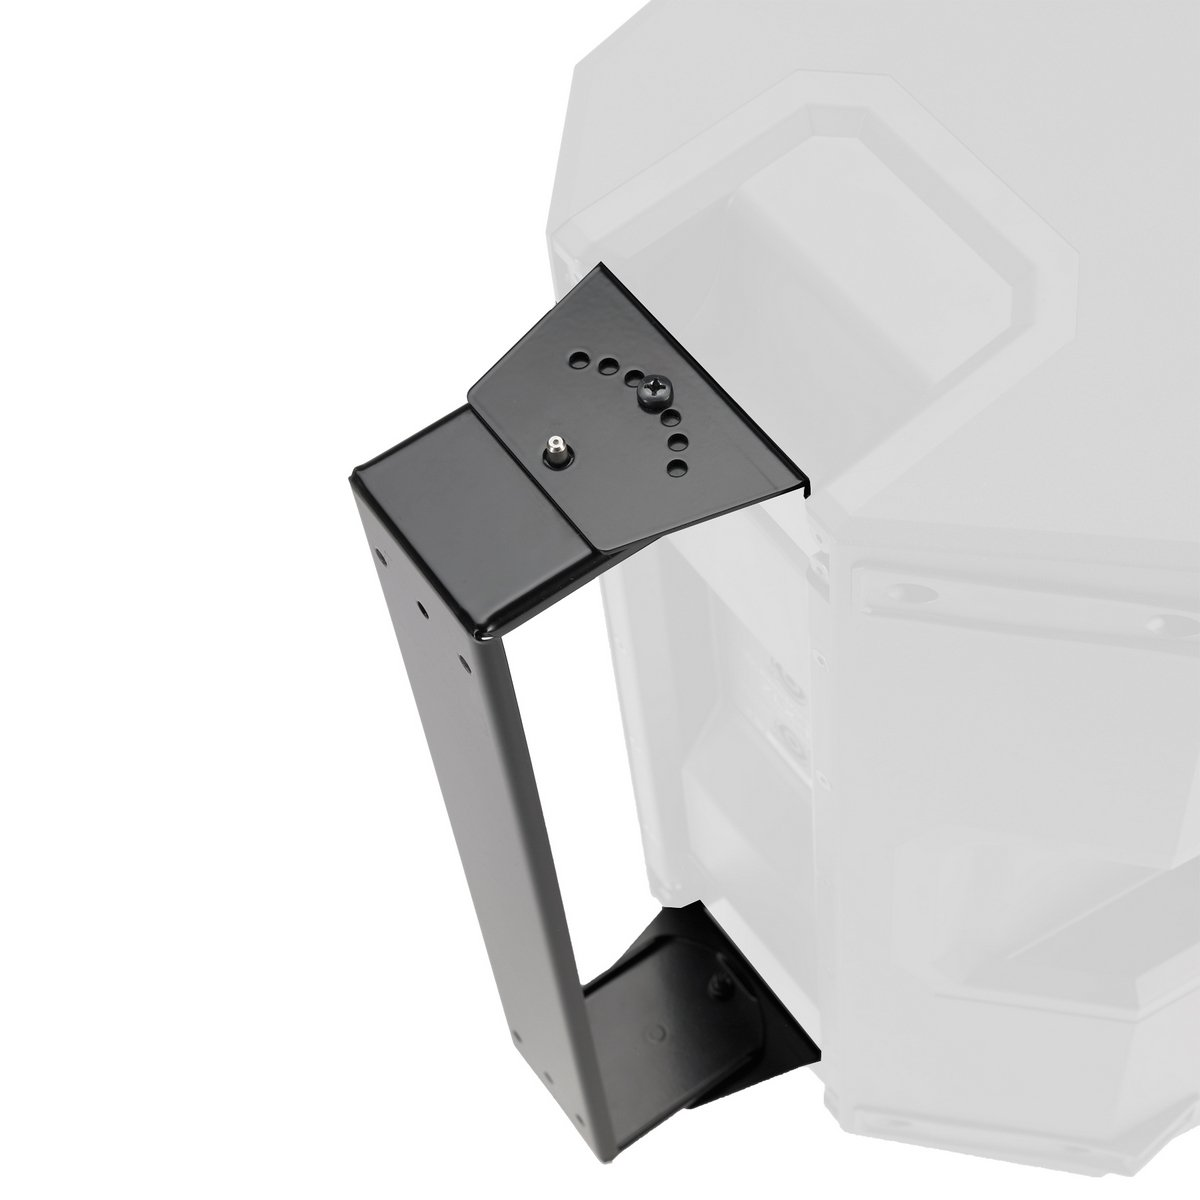 Electro-Voice ZLX-BRKT | Bracket for ZLX-12 ZLX-12P ZLX-15 ZLX-15P by Electro-Voice (Image #1)